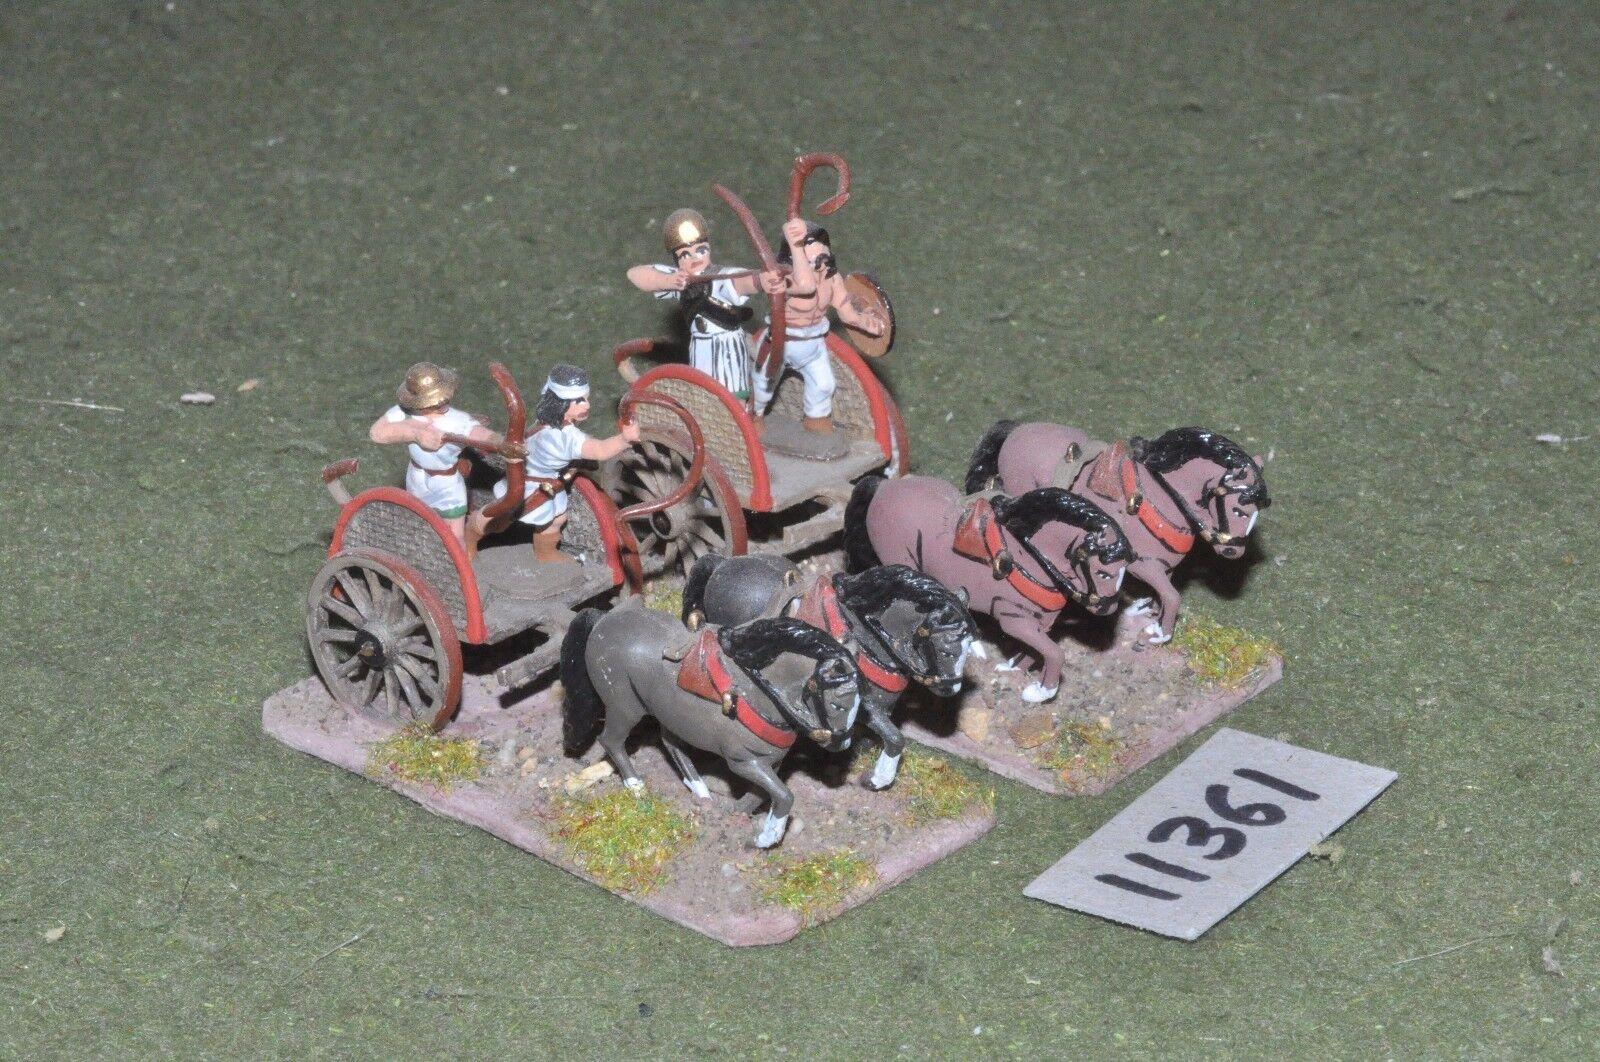 25mm medieval   gasgan - chariots 2 chariots - chariots (11361)